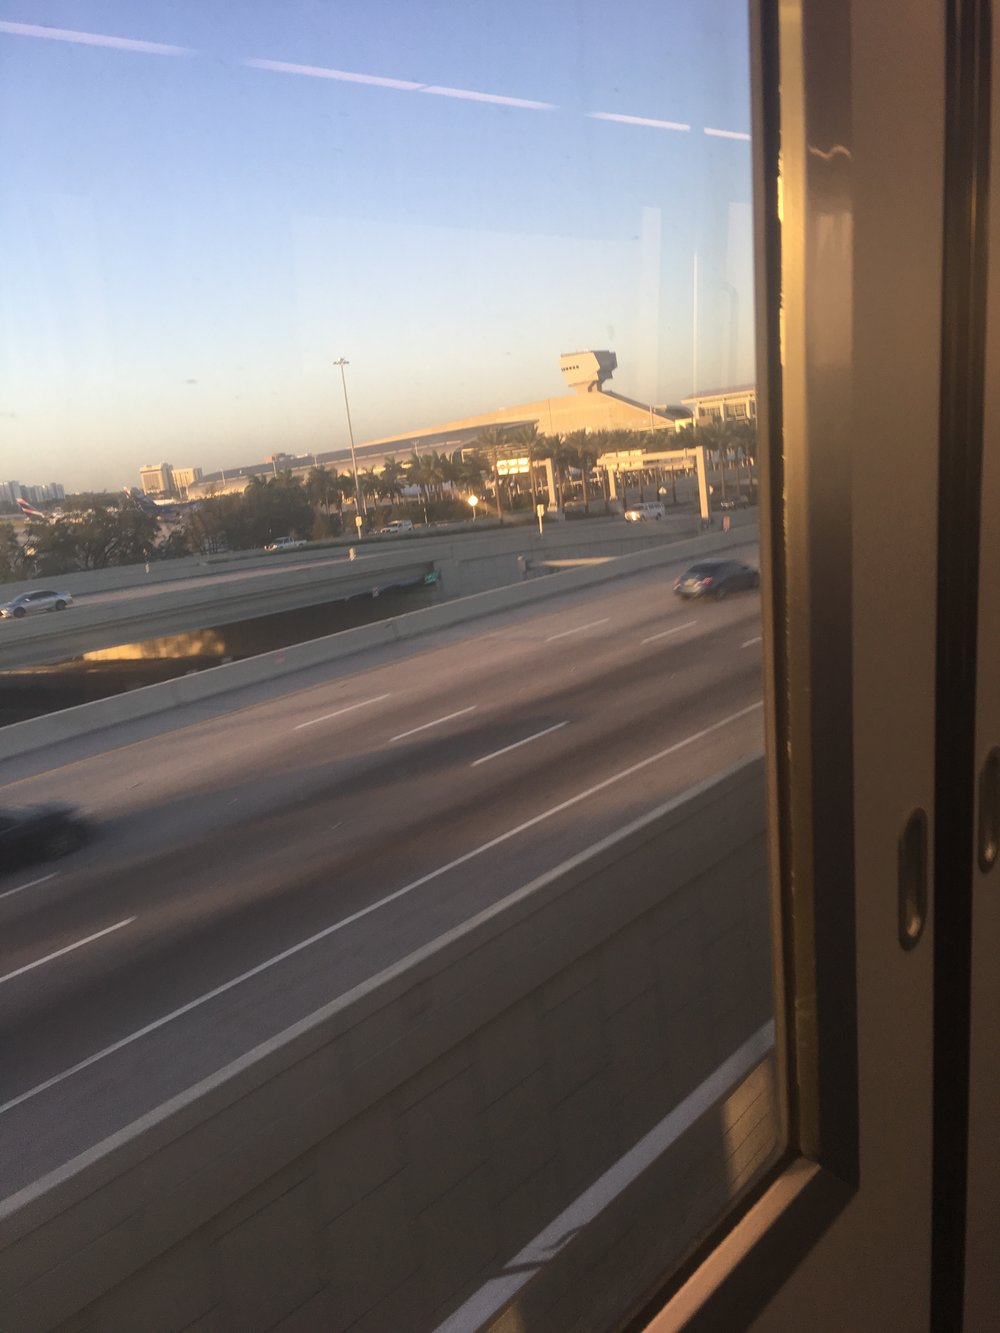 MIA mover train to the rental car center